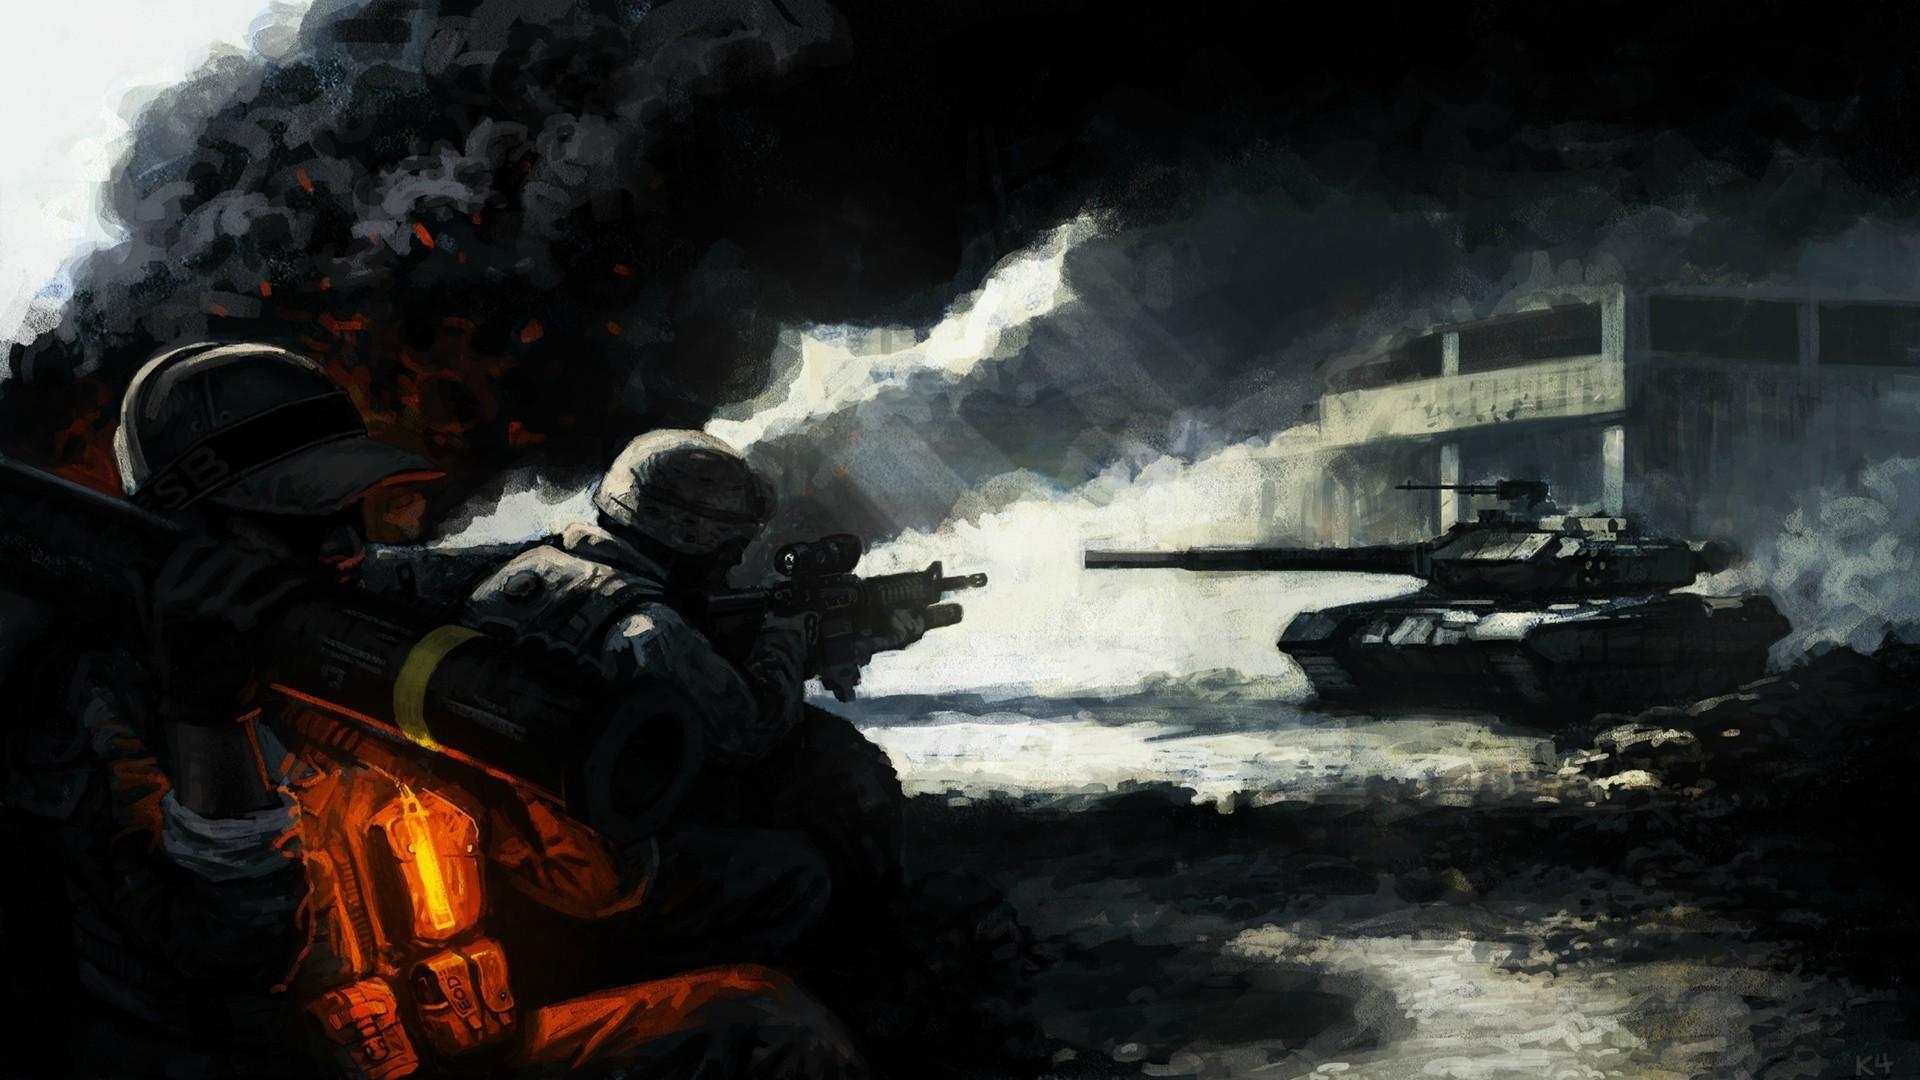 334423_art_soldaty_pexota_tank_oruzhie_dym_pepel_svet_zda_1920x1080_www.GdeFon.ru_